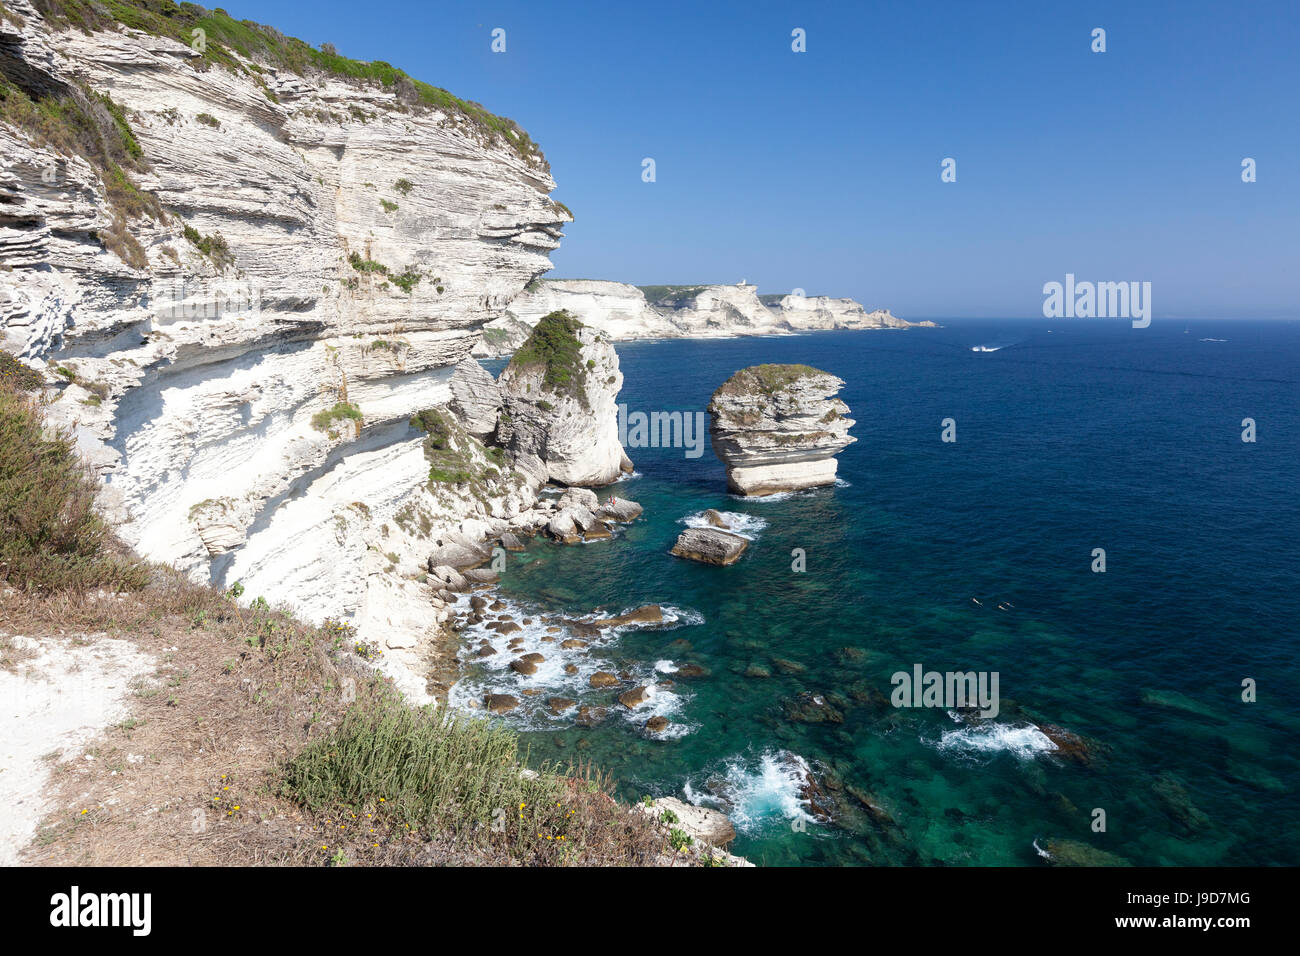 Sun shines on the white limestone cliffs framed by the turquoise sea, Bonifacio, Corsica, France, Mediterranean, Stock Photo